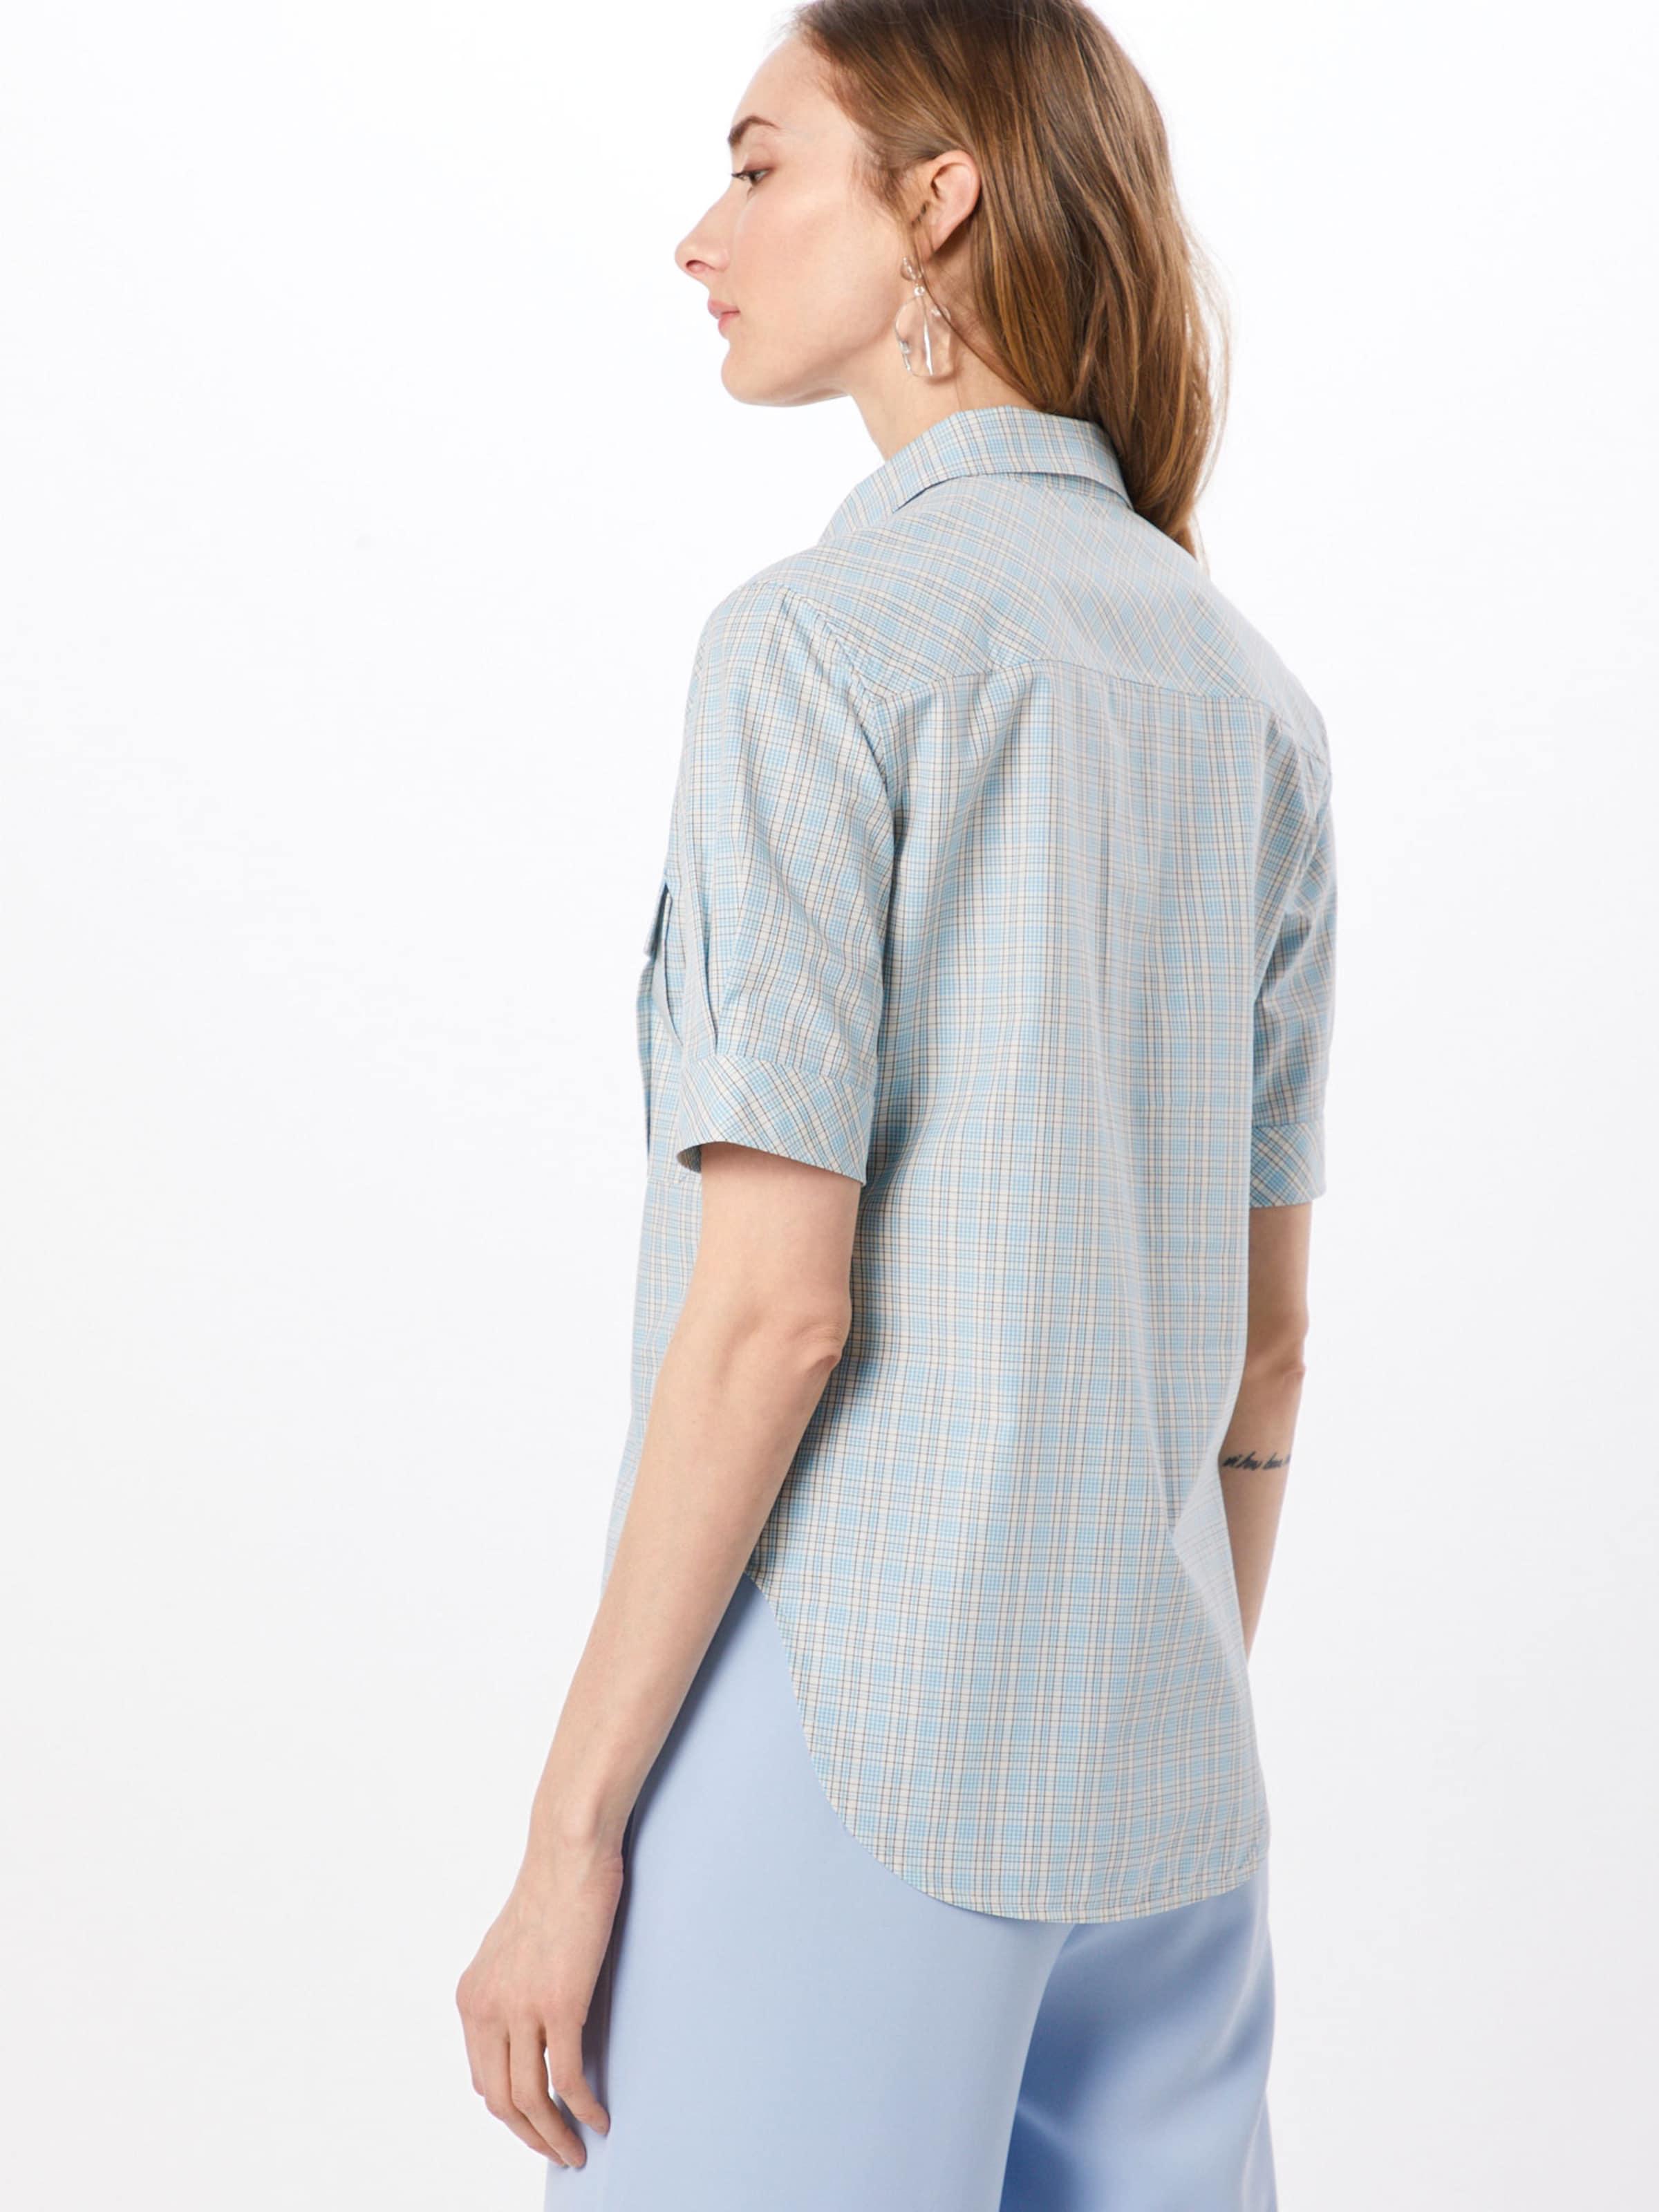 Bluse Klein Chk In Blau Ss' 'farmhouse Calvin Shirt OPlkXuwZiT